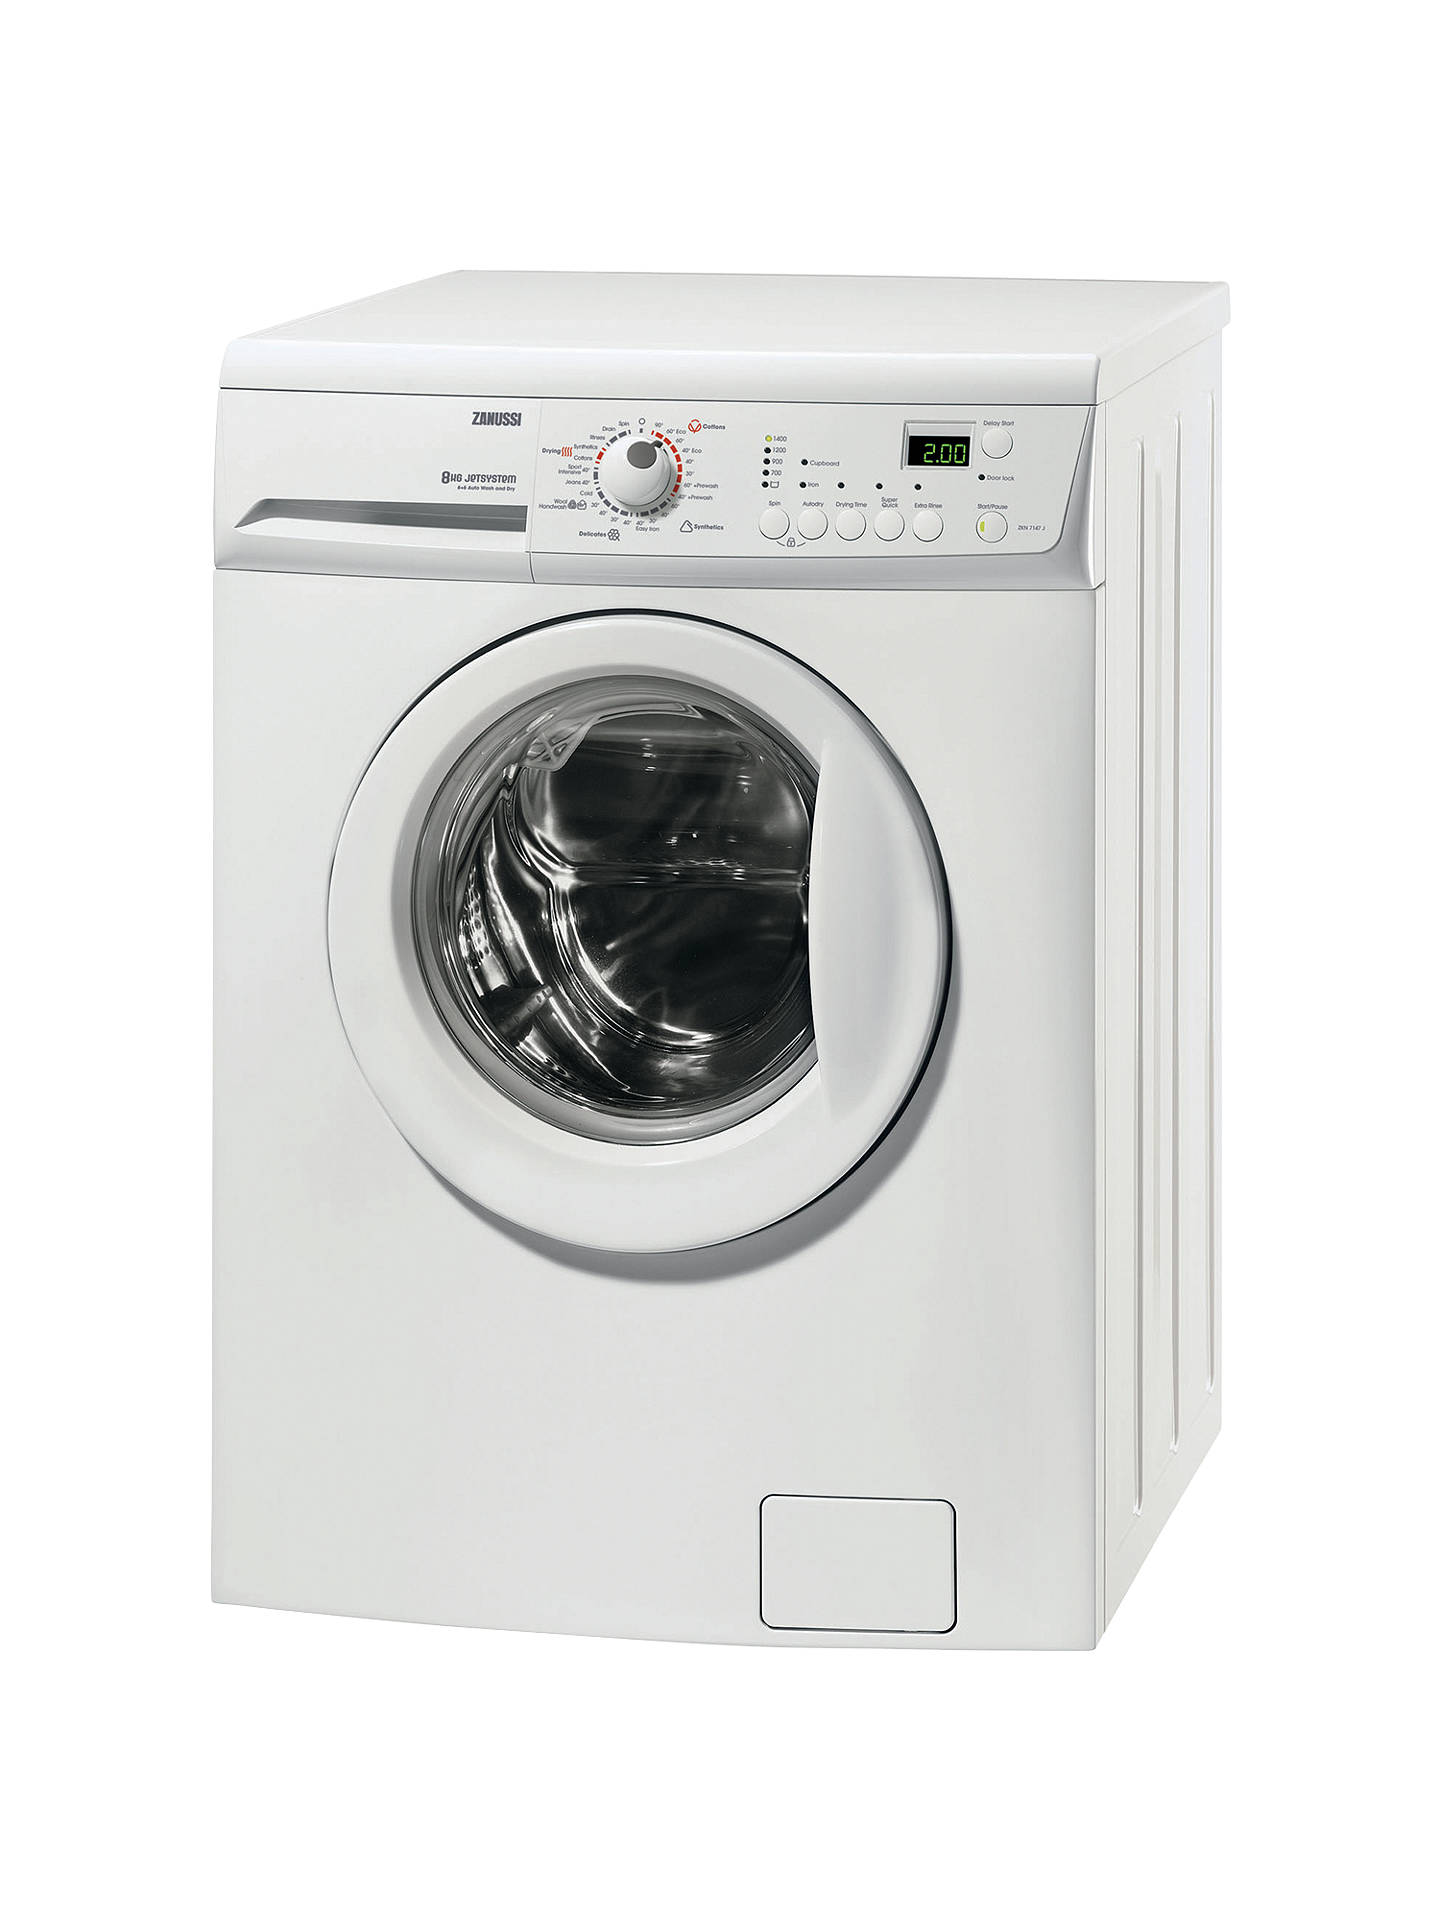 zanussi zkn7147j washer dryer 8kg wash 6kg dry load a energy rh johnlewis com electrolux zanussi washing machine instruction manual In-House Dryer and Washing Machine